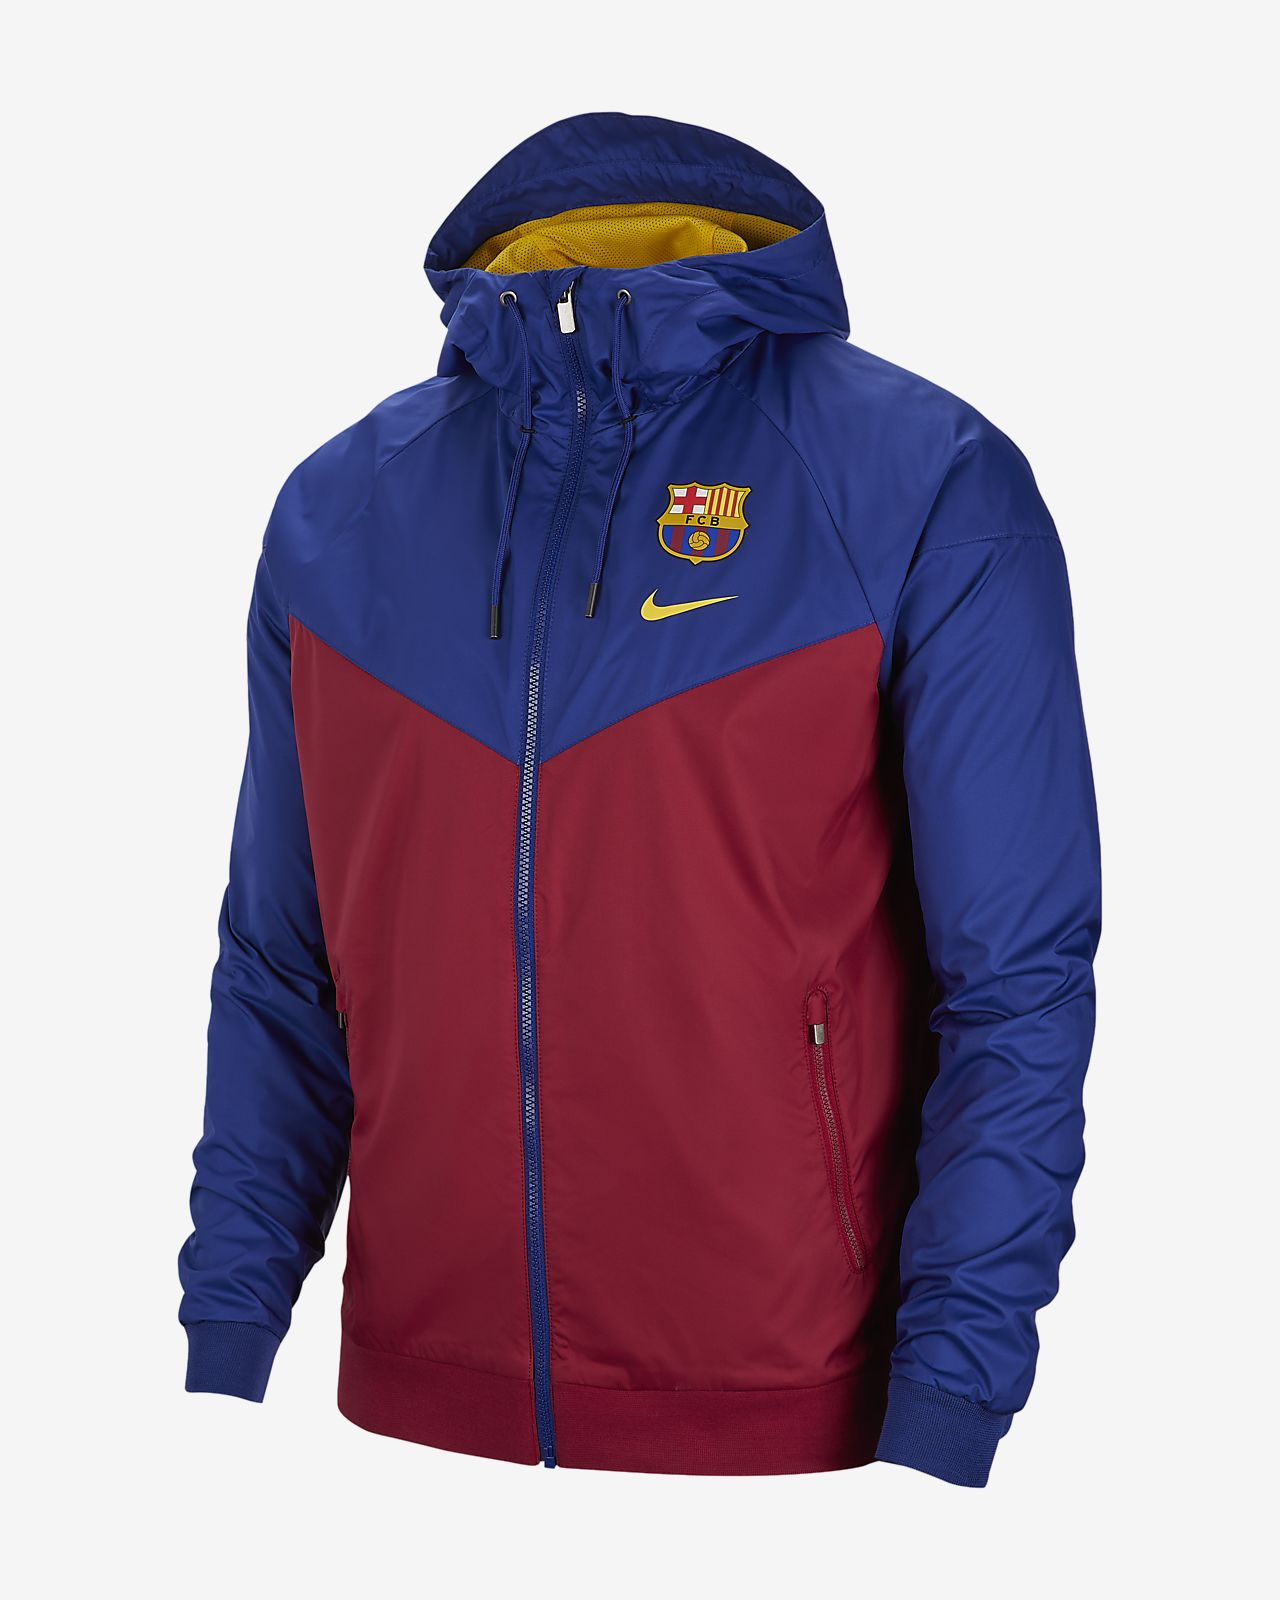 sale retailer 84f89 9b46c FC Barcelona Windrunner Men's Jacket